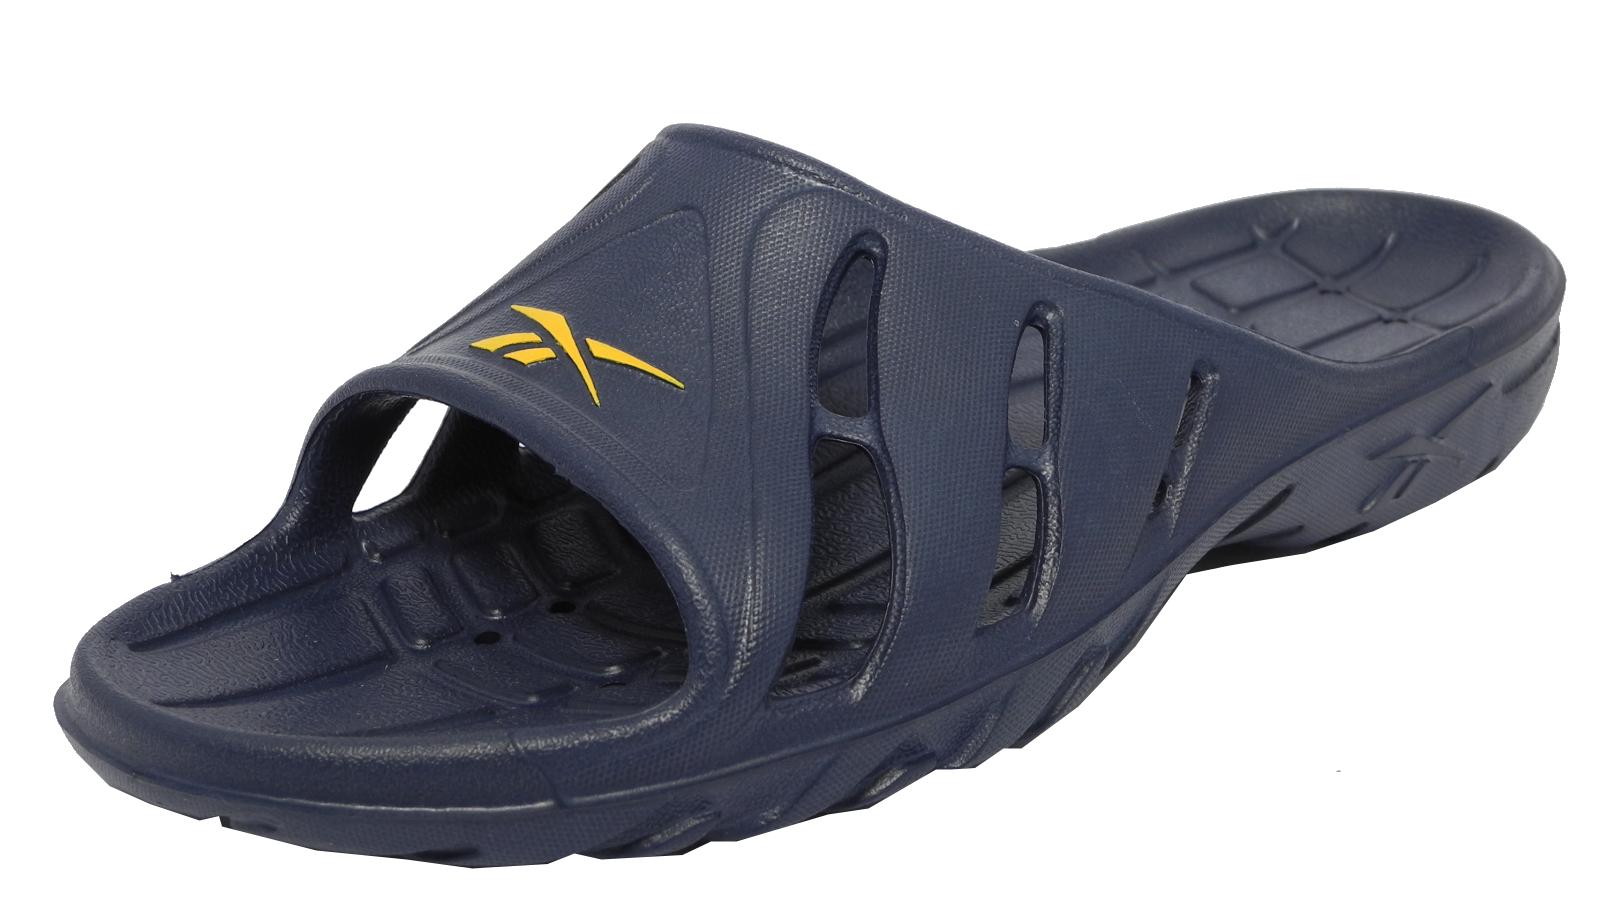 4857e71b3 Image is loading Mens-Reebok-Kobo-IV-Lightweight-Rubber-Beach-Sandals-